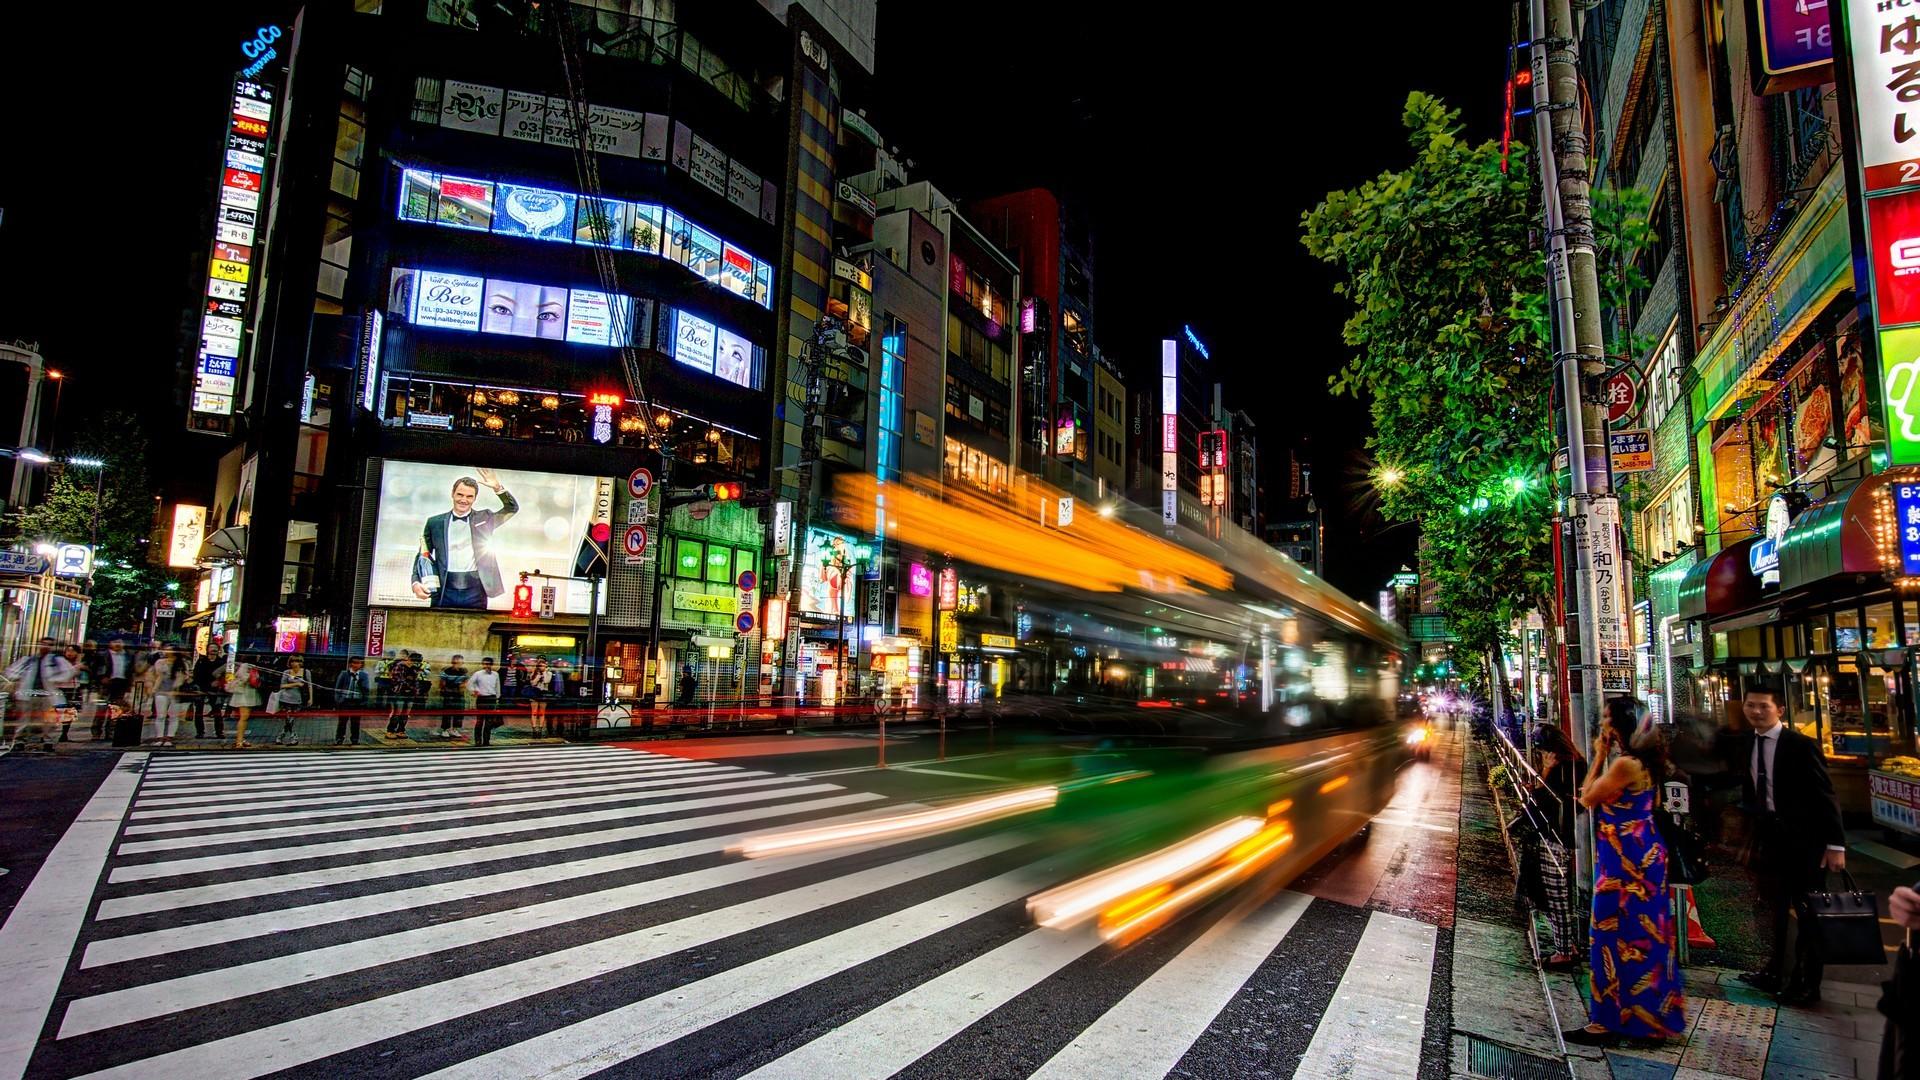 General 1920x1080 cityscape night street Japan